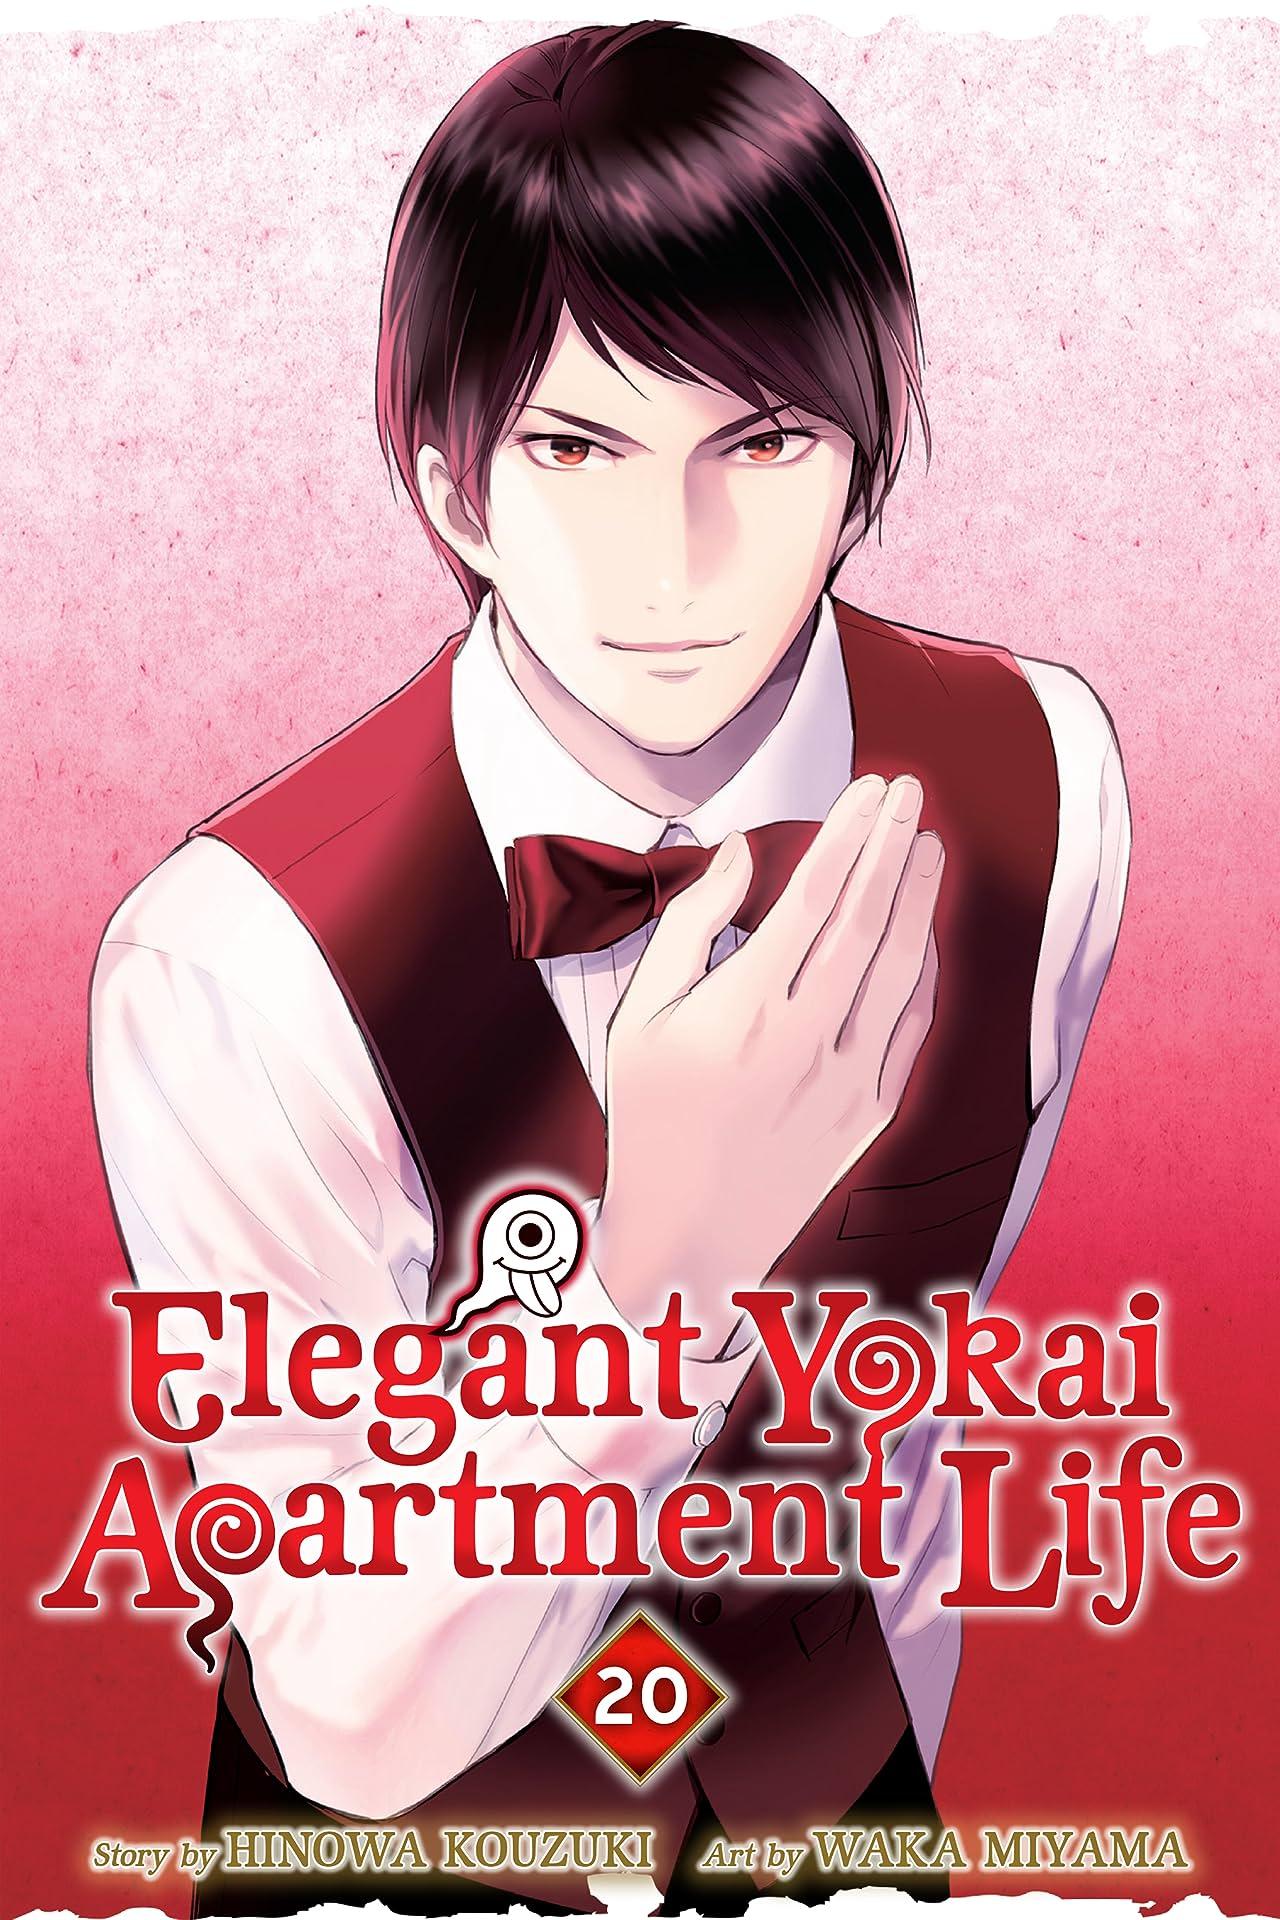 Elegant Yokai Apartment Life Vol. 20